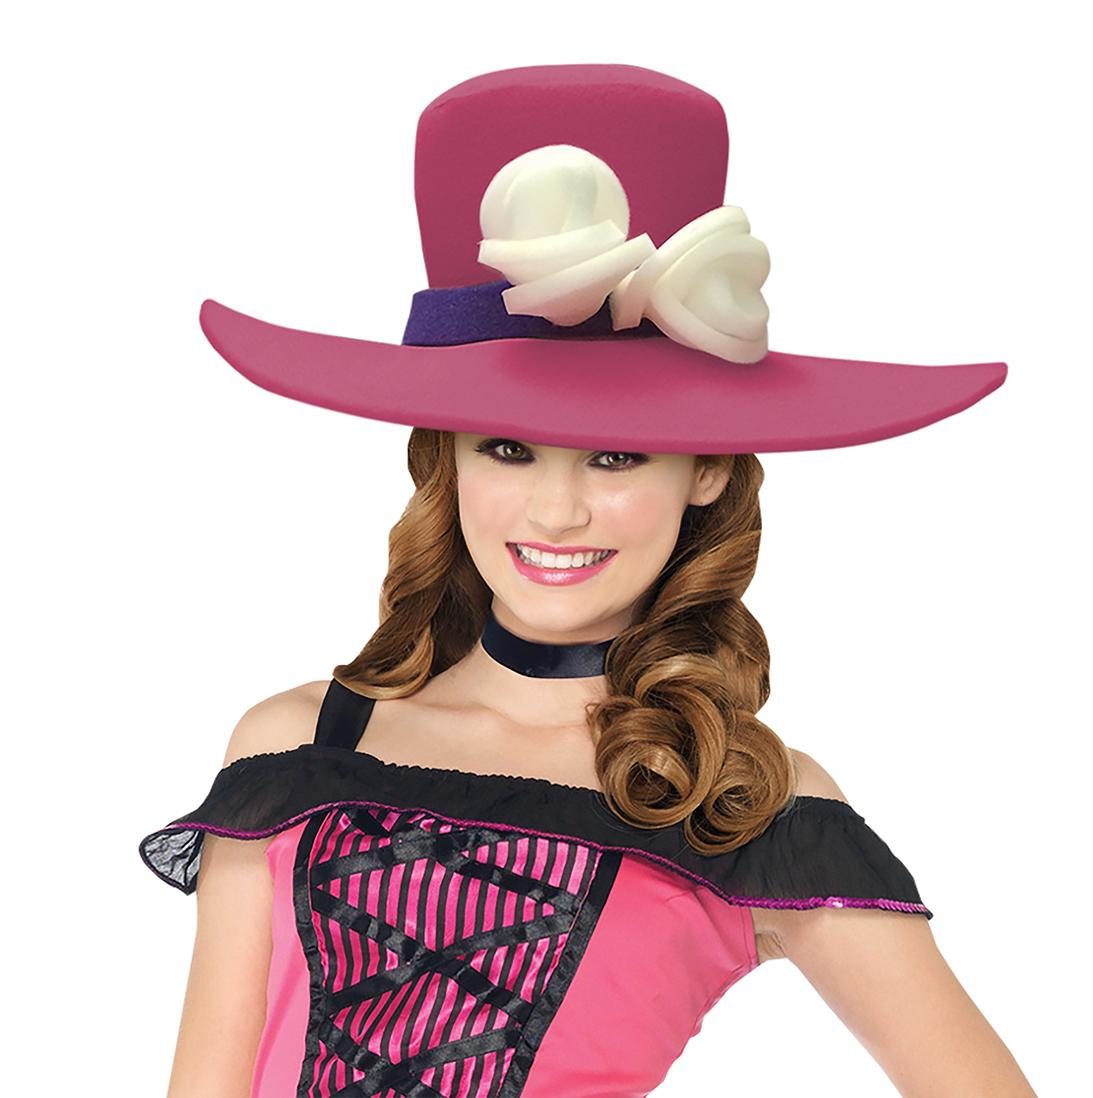 Flower Fedora Adult Foam Costume Hat - One Size - image 1 de 1